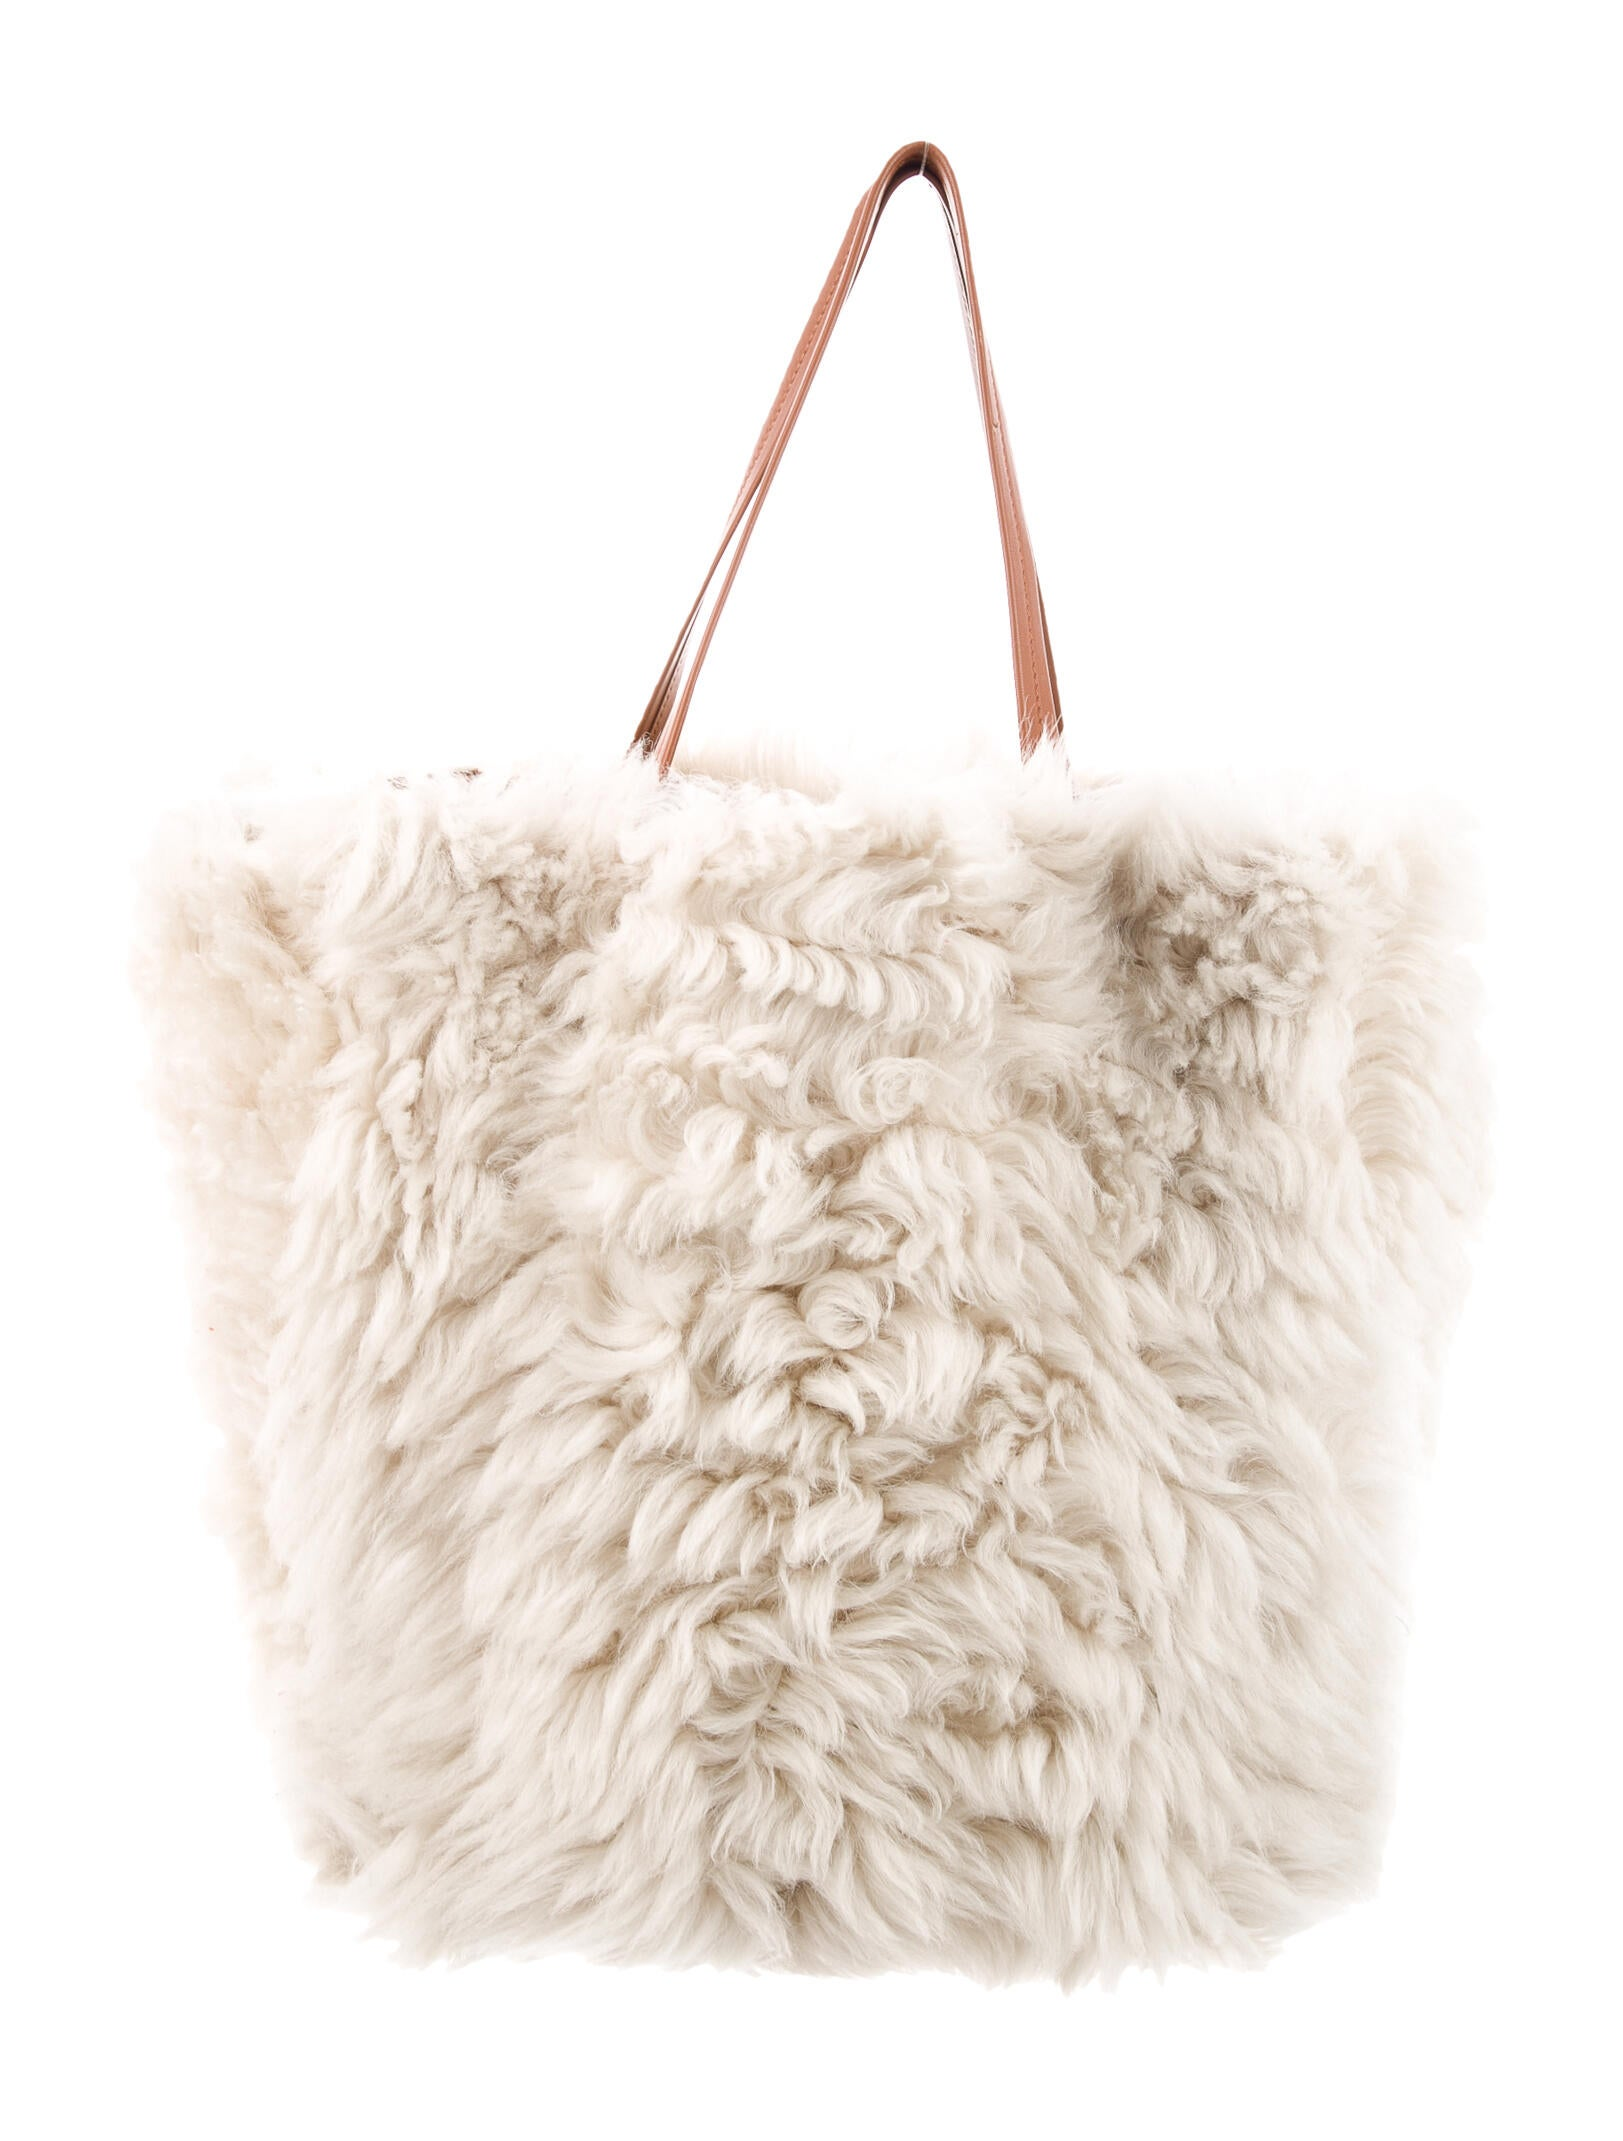 Celine Shearling Cabas Phantom Tote - Handbags -           CEL132373   The RealReal